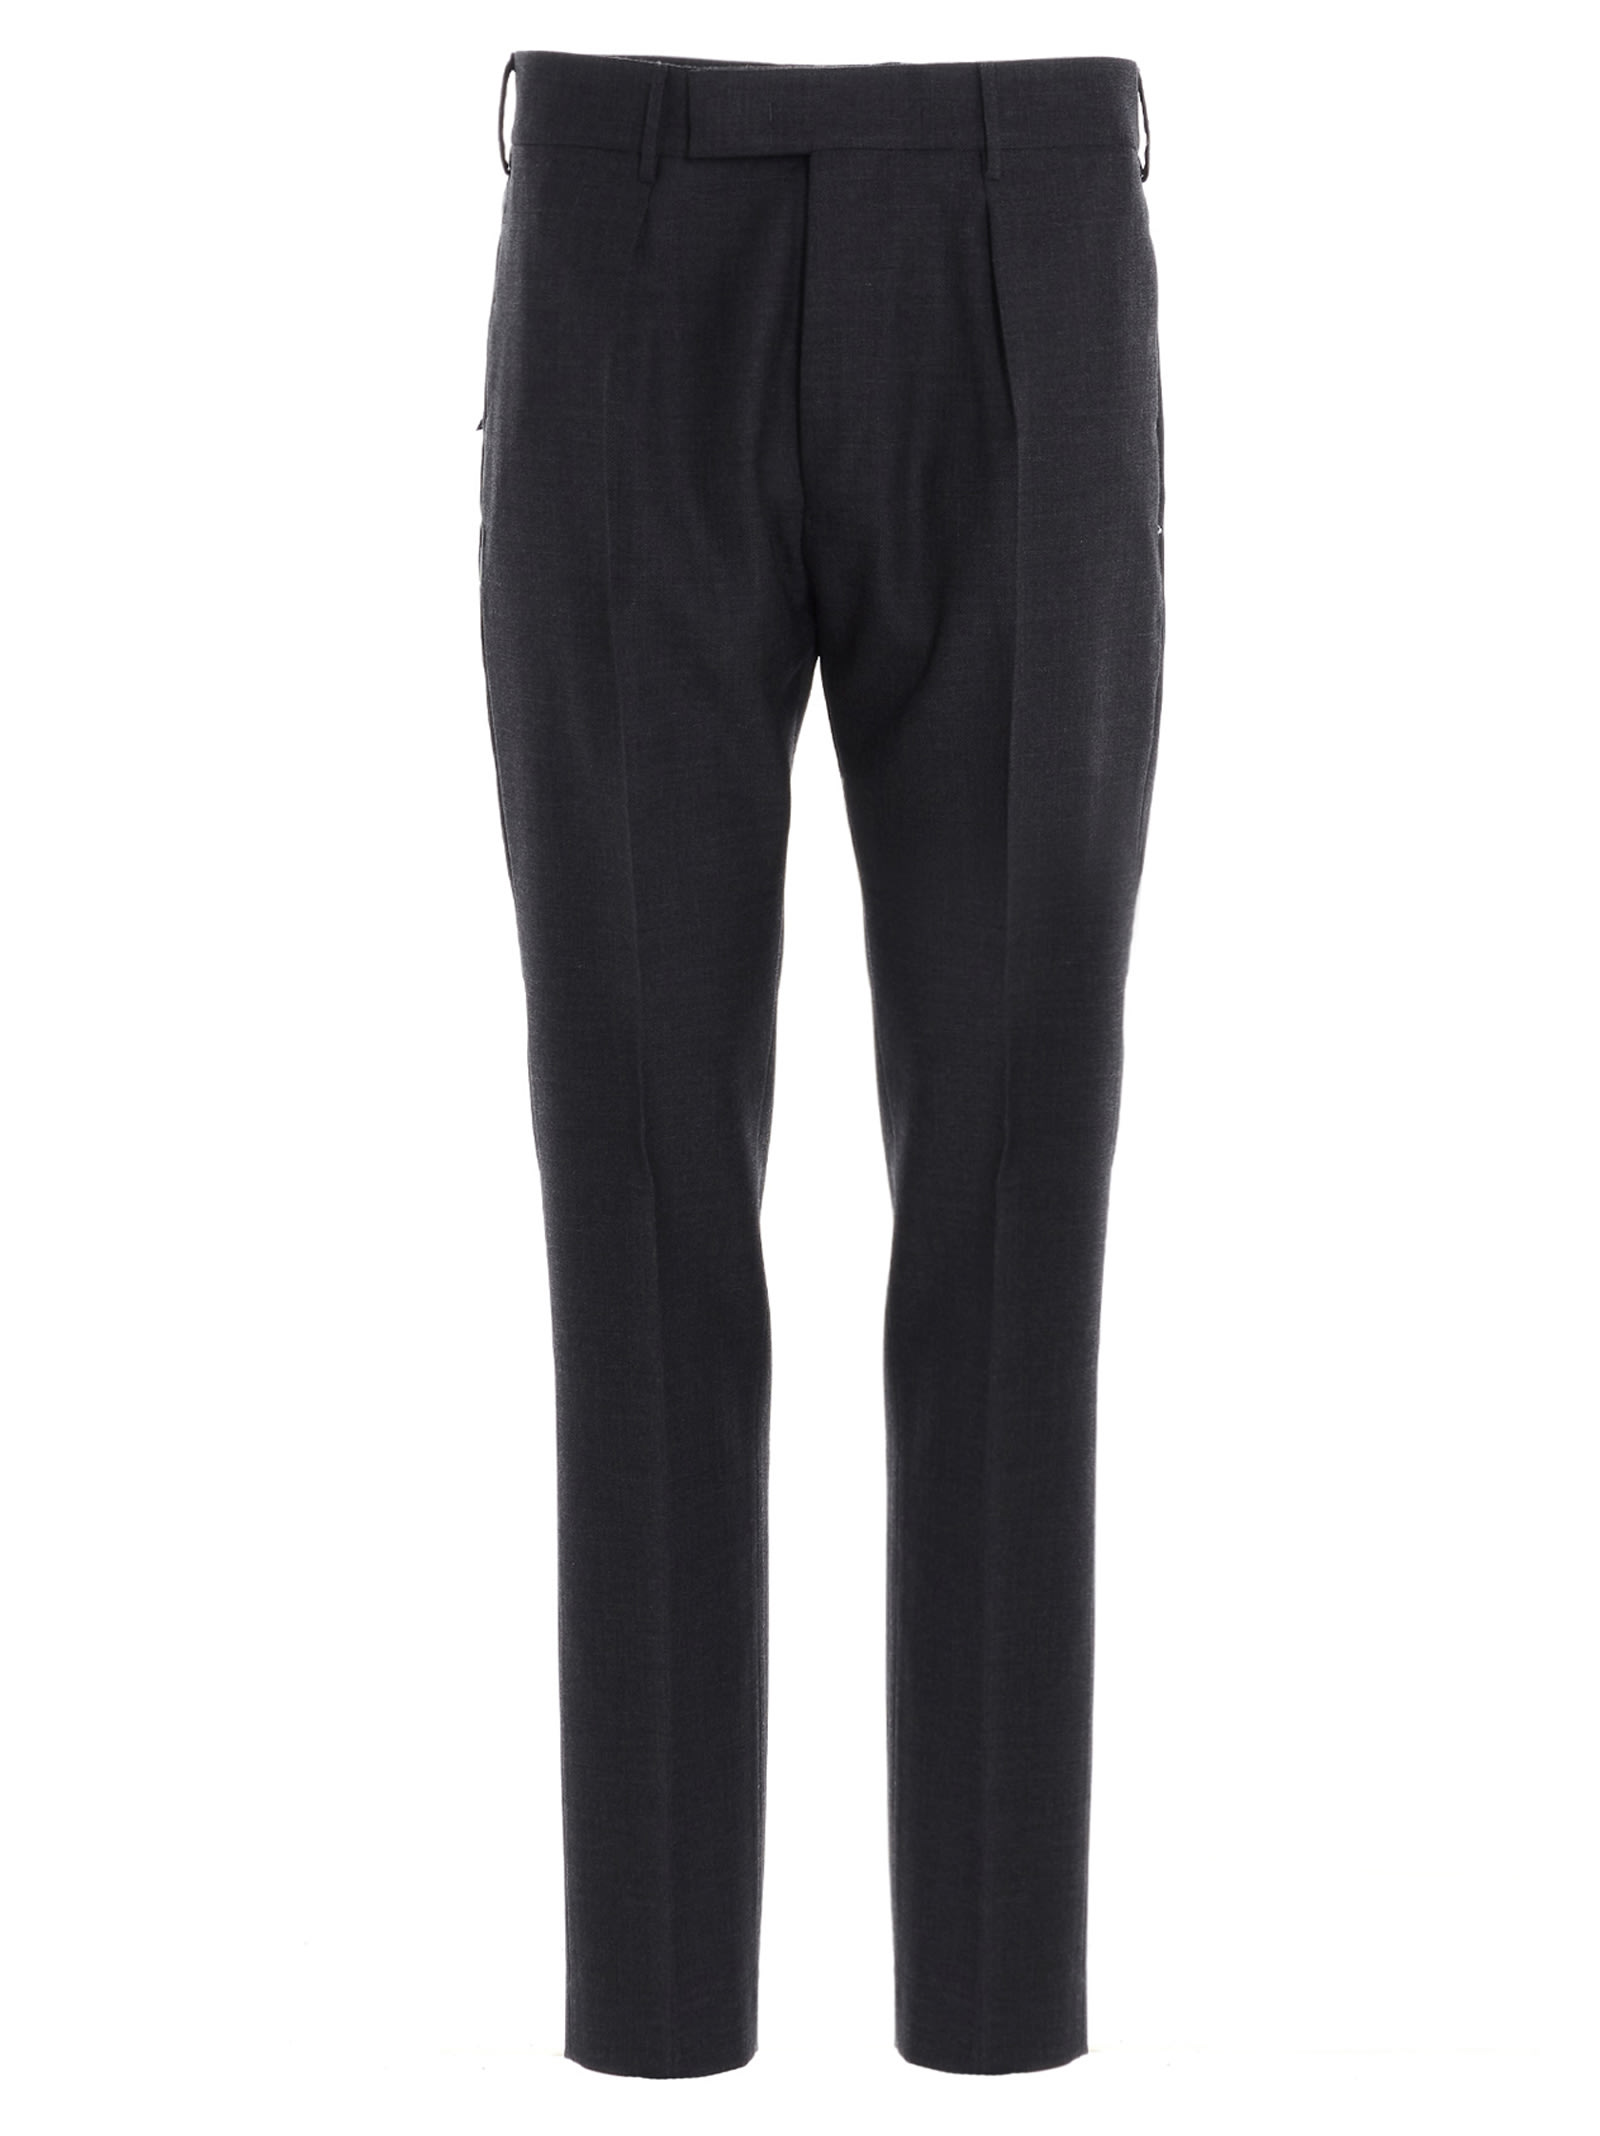 Pt01 edge Pants